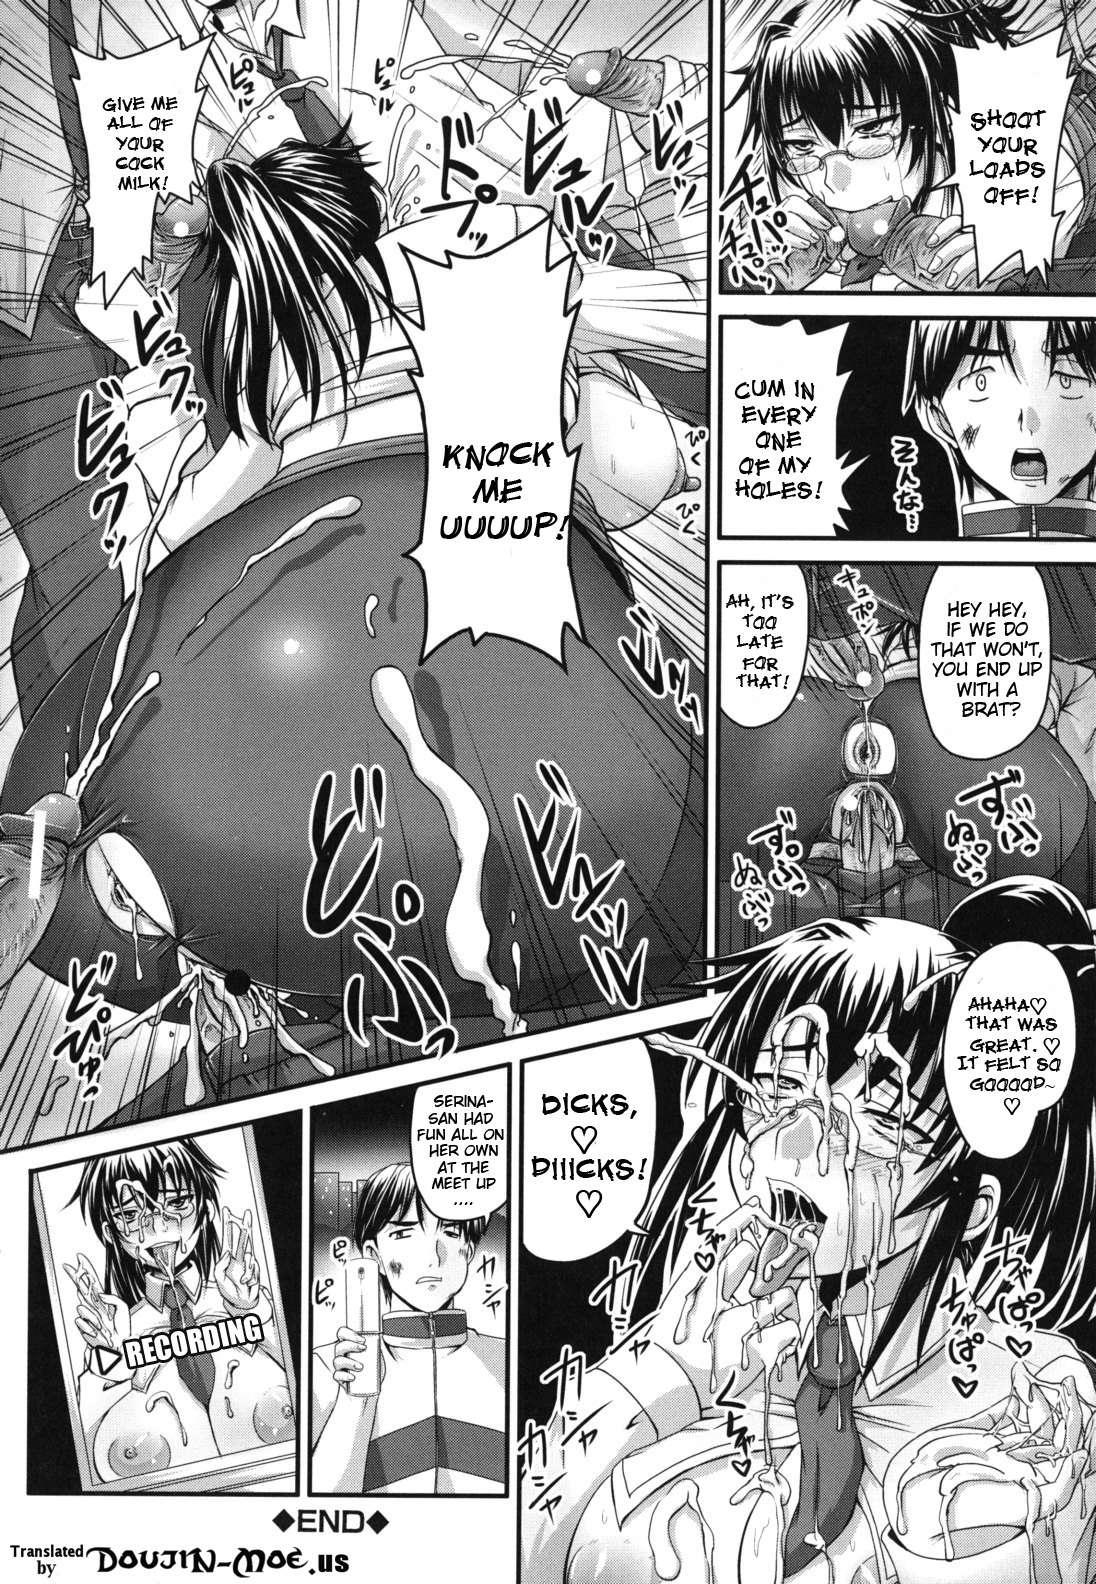 Get Pregnant Hentai reading get pregnant, you dirty slut (original) hentai